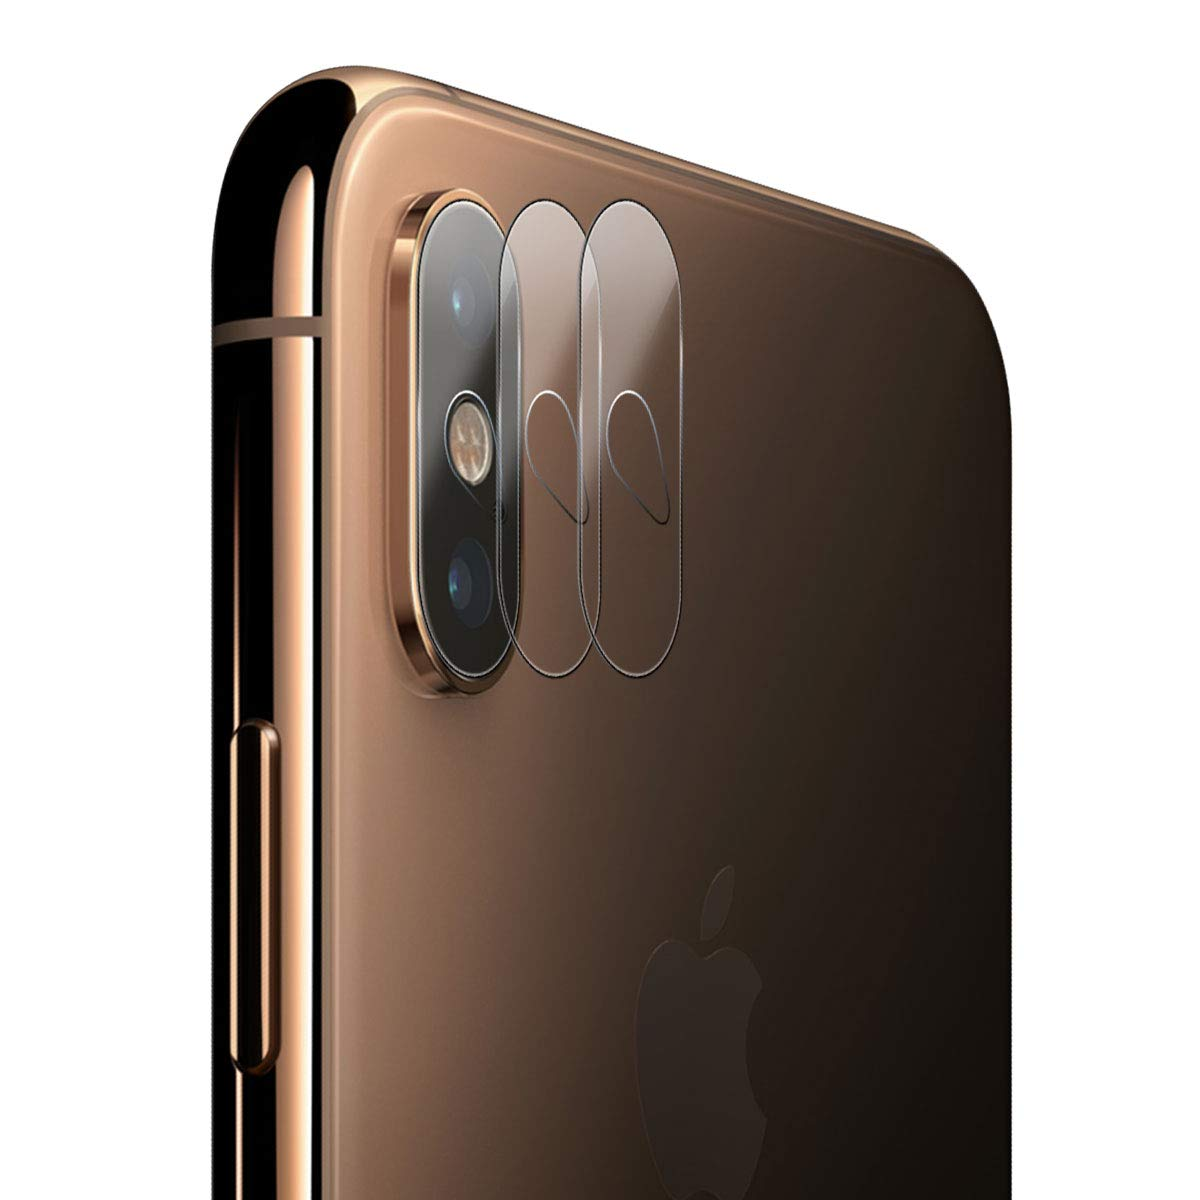 Protector Lente Para Iphone Xs Max [3 Un.] CE CENTAURUS